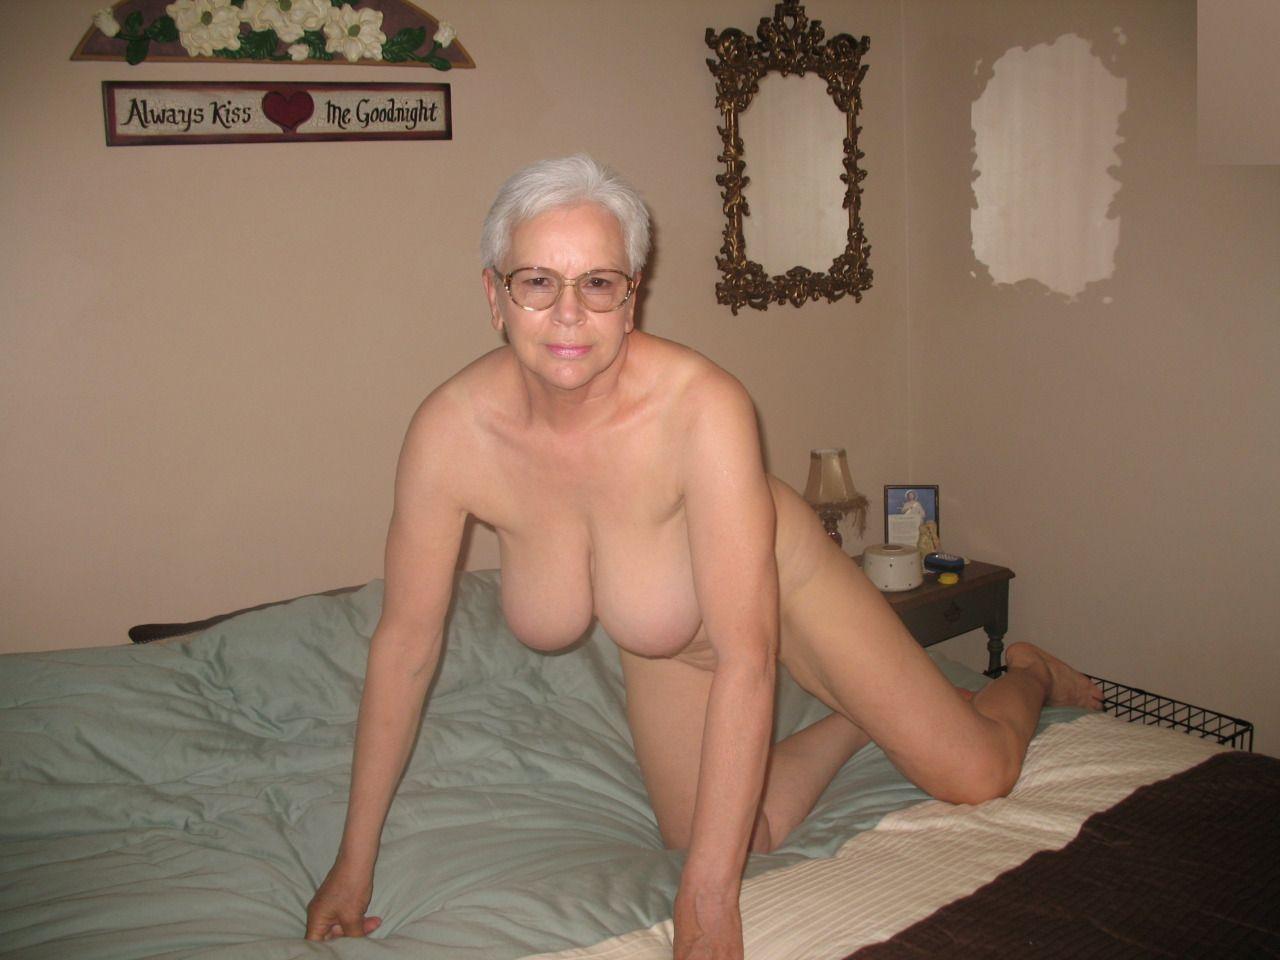 Ass hot amateur seniors nude affair